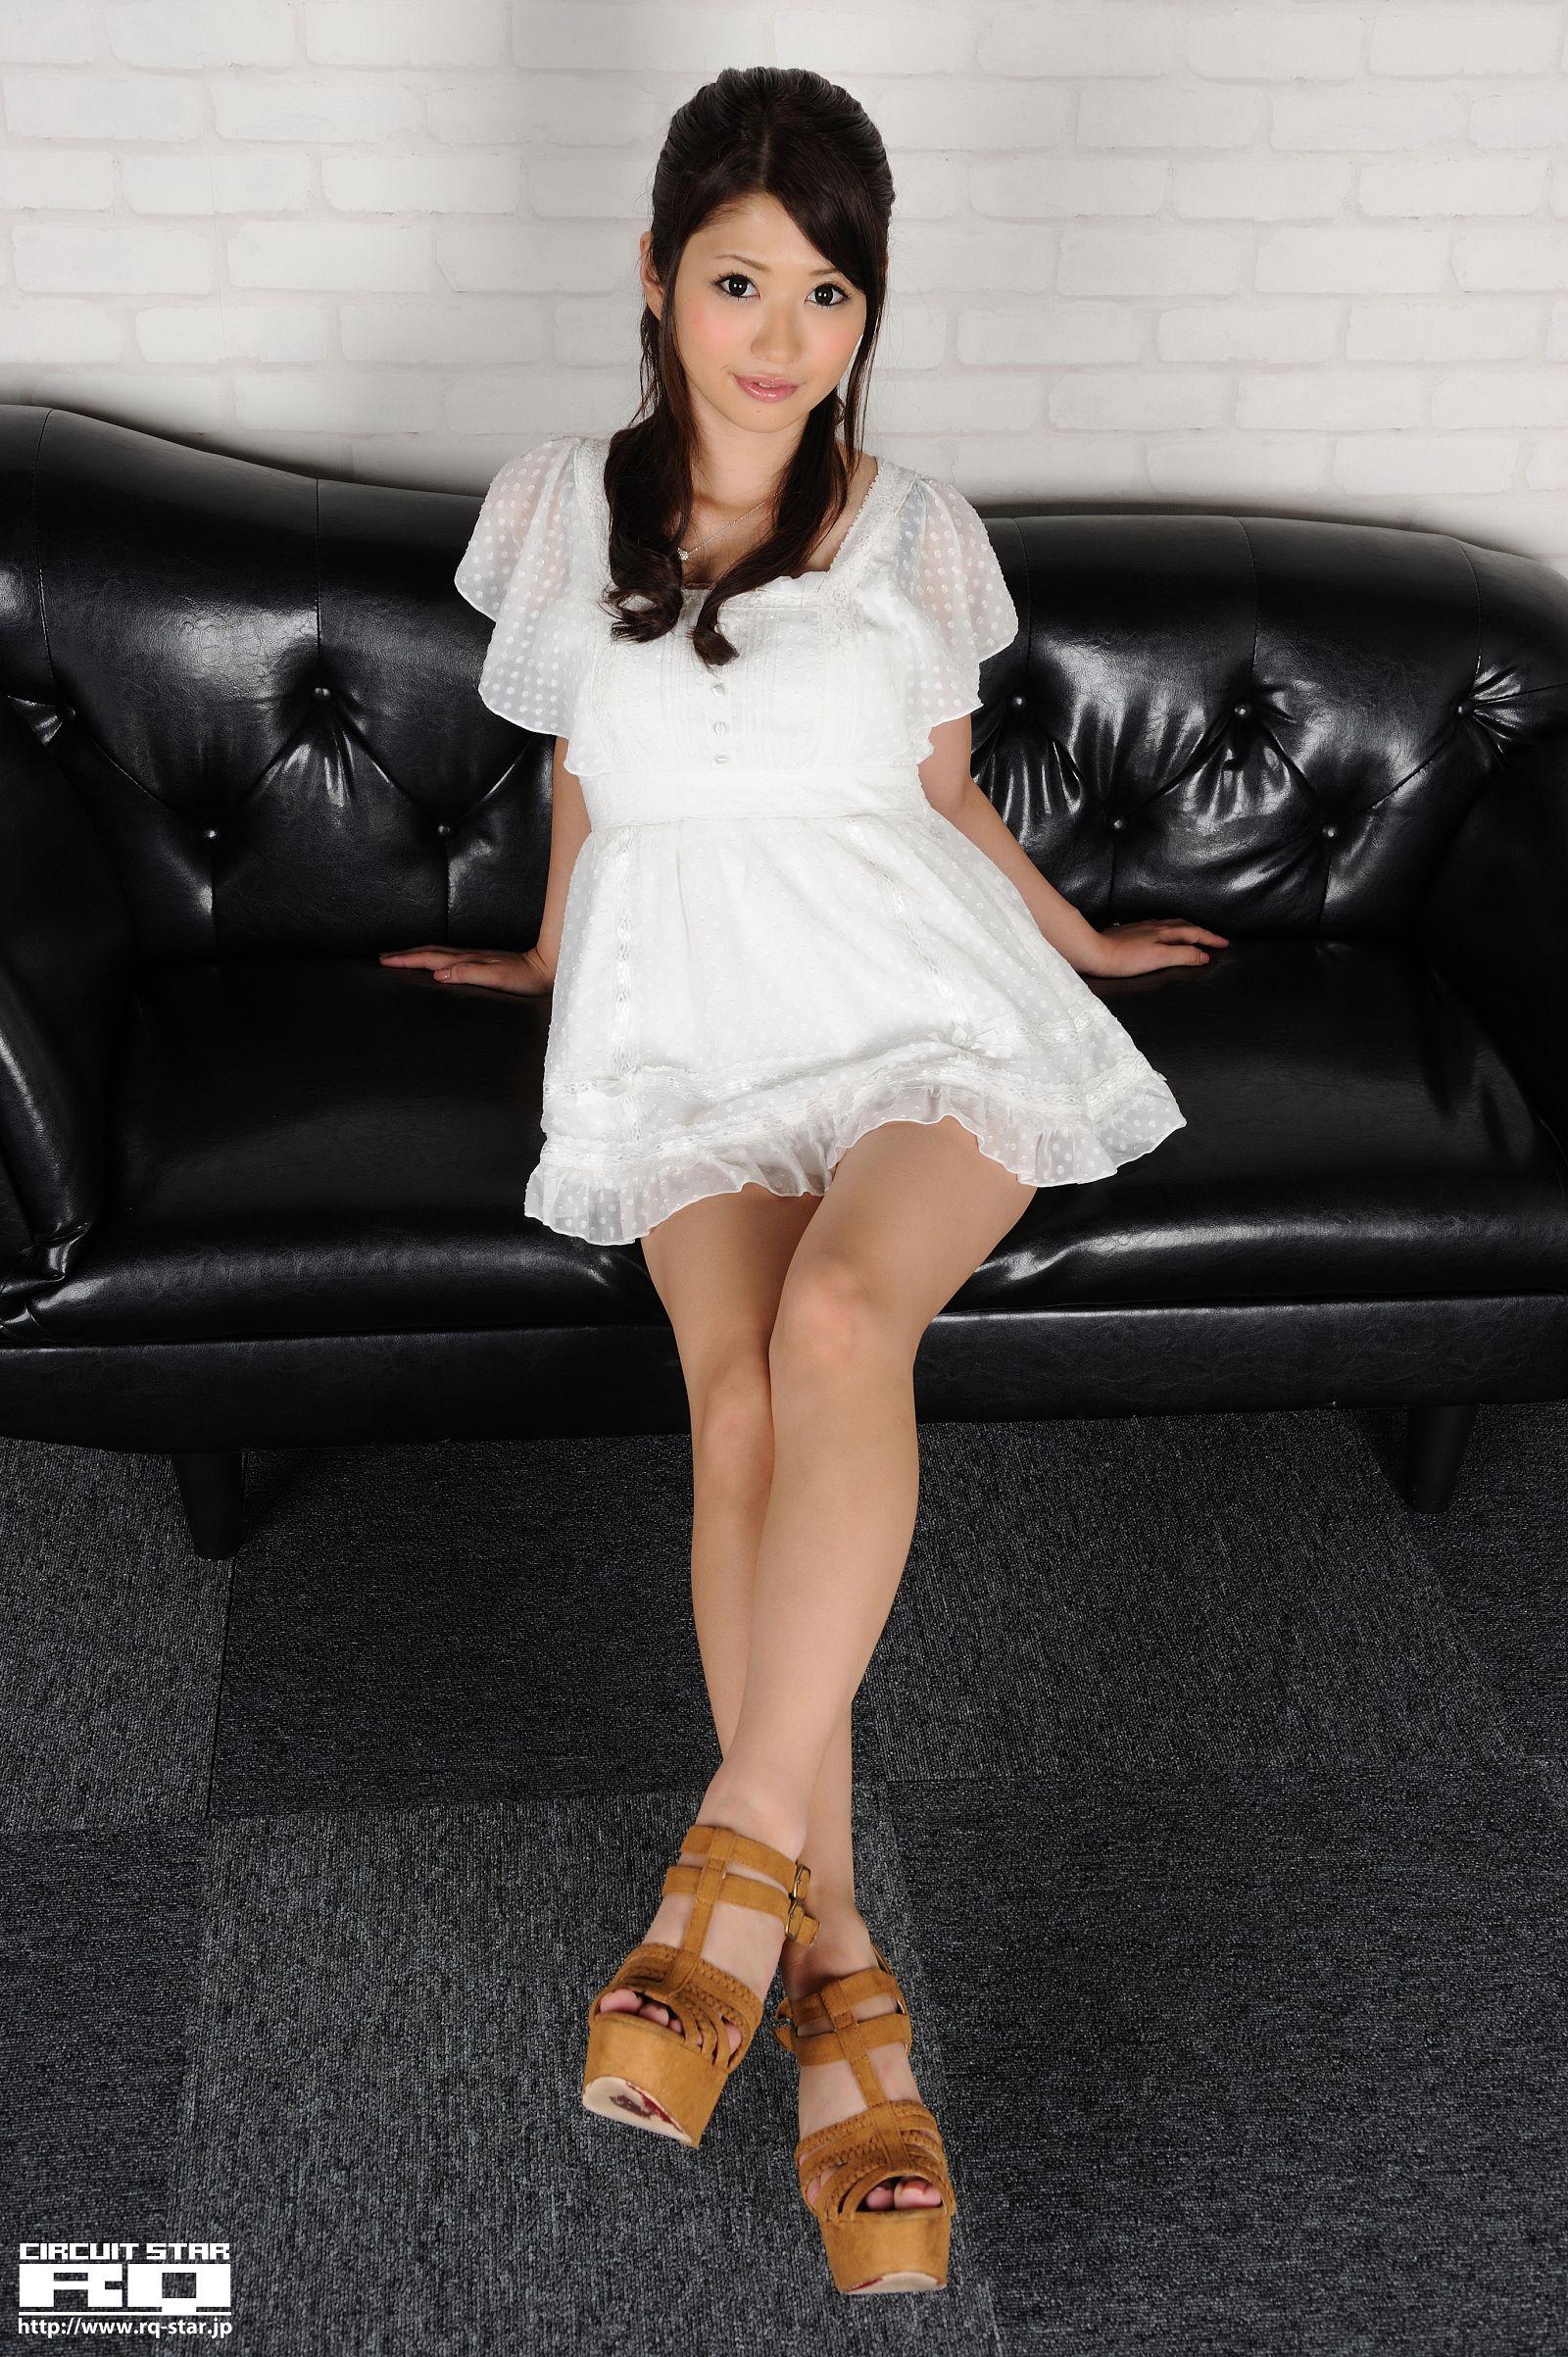 [RQ STAR美女] NO.01092 Hitomi Nose 能勢ひとみ Private Dress[72P] RQ STAR 第2张